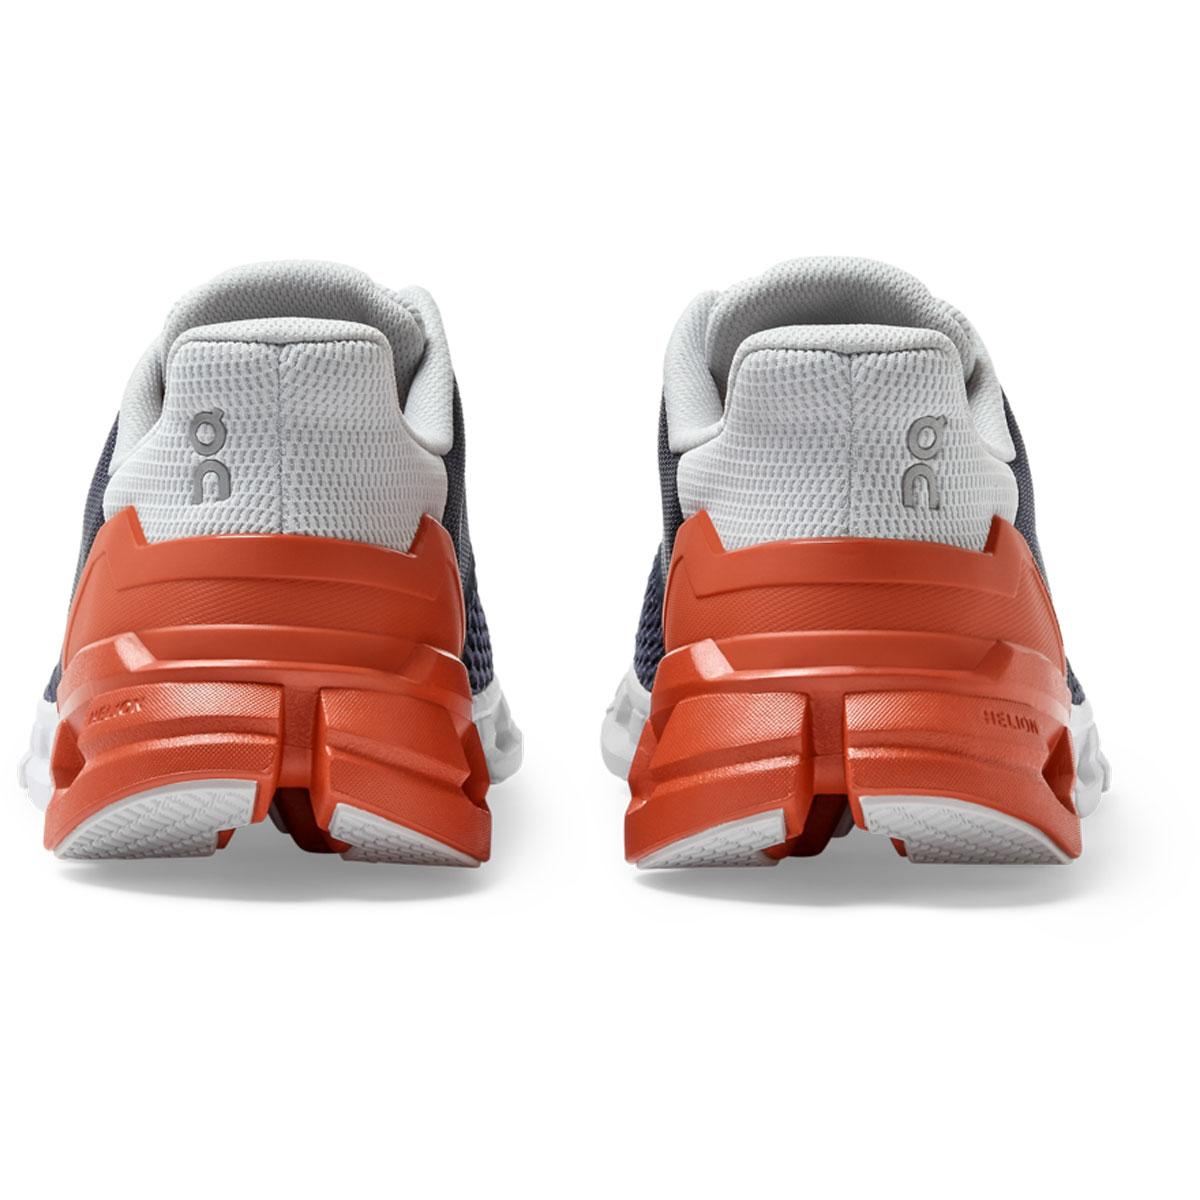 Men's On Cloudflyer 2.0 Running Shoe - Color: Midnight/Rust - Size: 7 - Width: Regular, Midnight/Rust, large, image 4